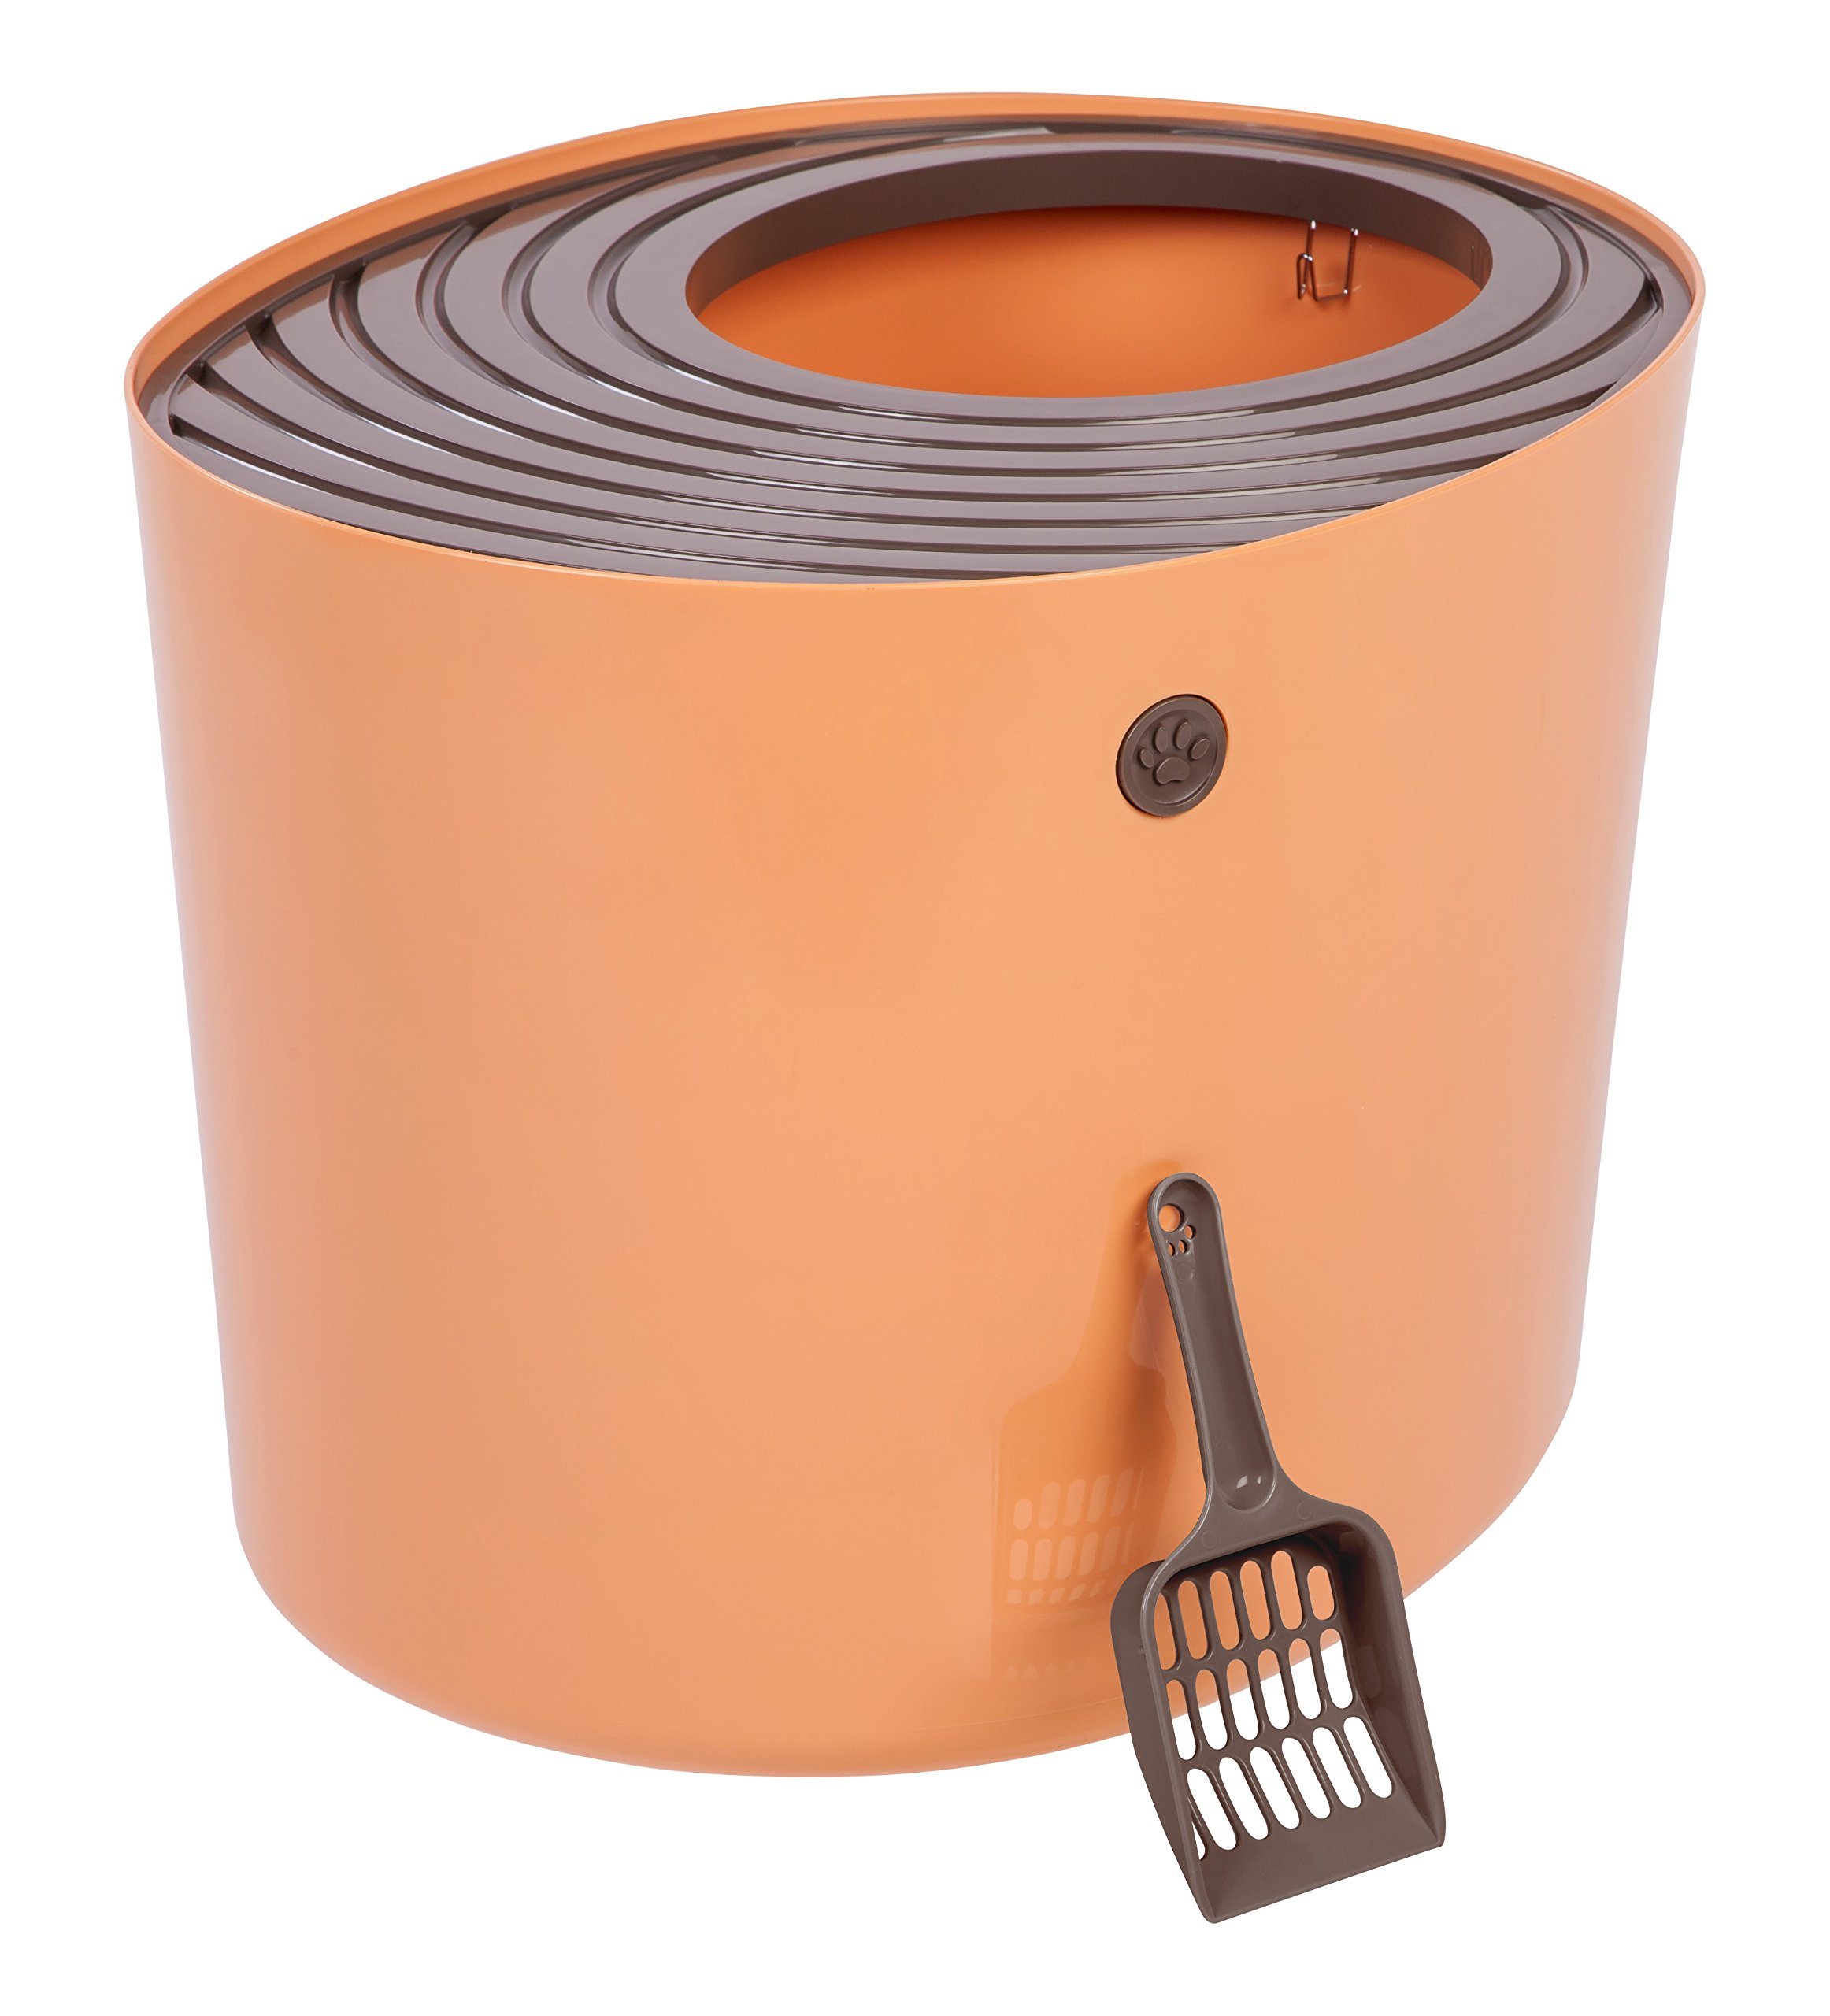 IRIS Top Entry Cat Litter Box with Cat Litter Scoop, Orange & Brown by IRIS USA, Inc.